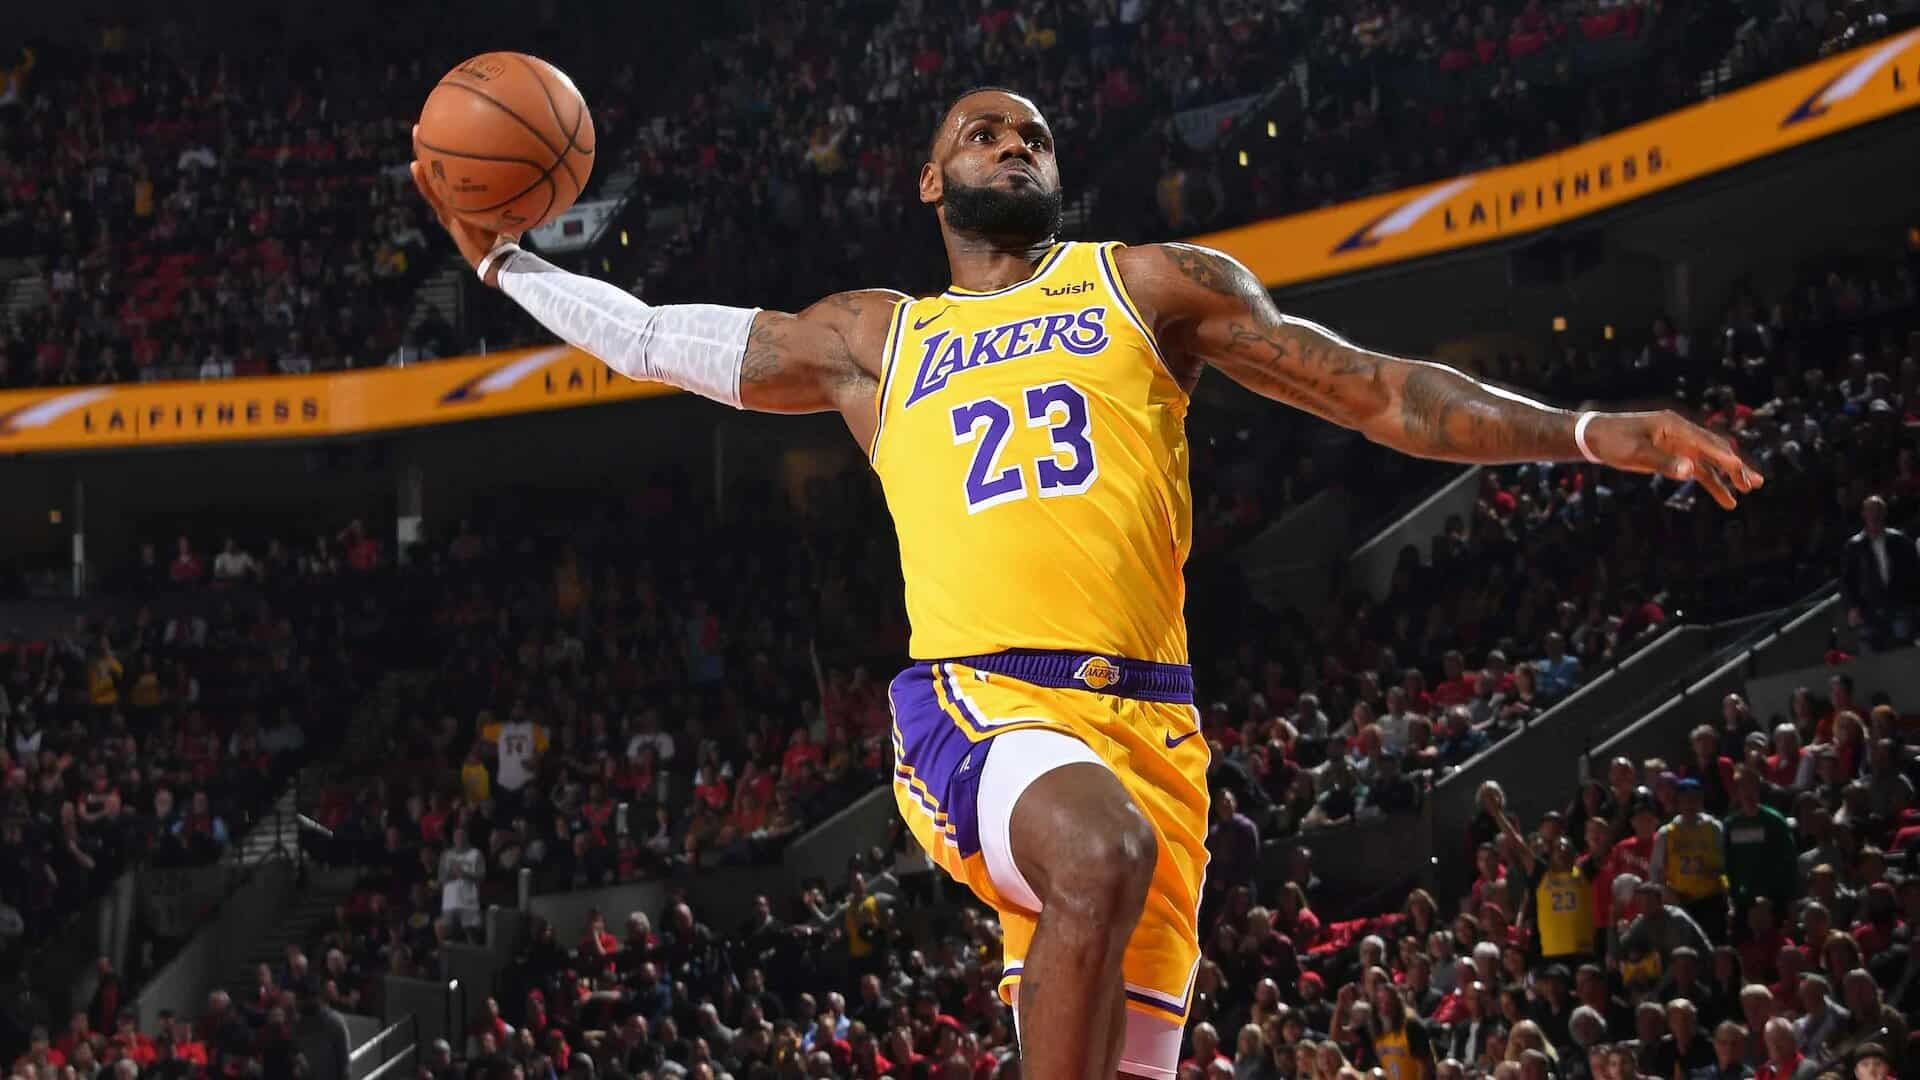 LeBron James dunk avec les Lakers